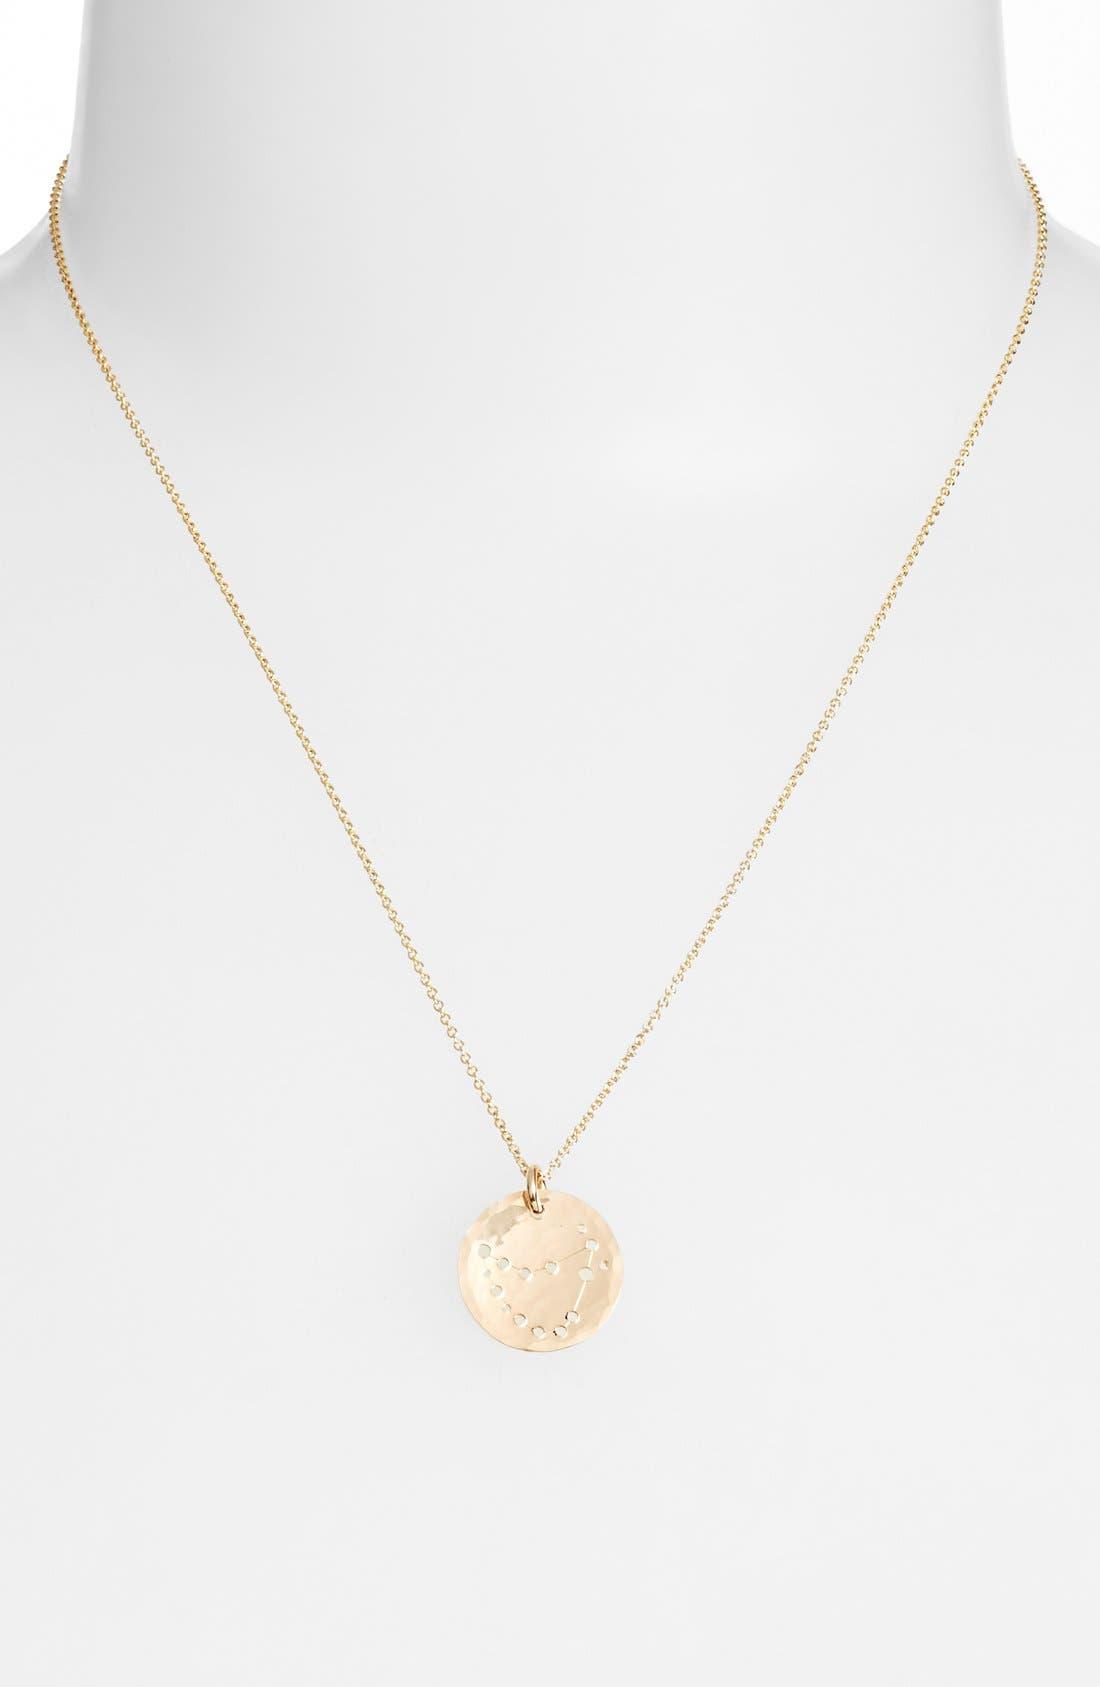 Ija 'Small Zodiac' 14k-Gold Fill Necklace,                             Alternate thumbnail 22, color,